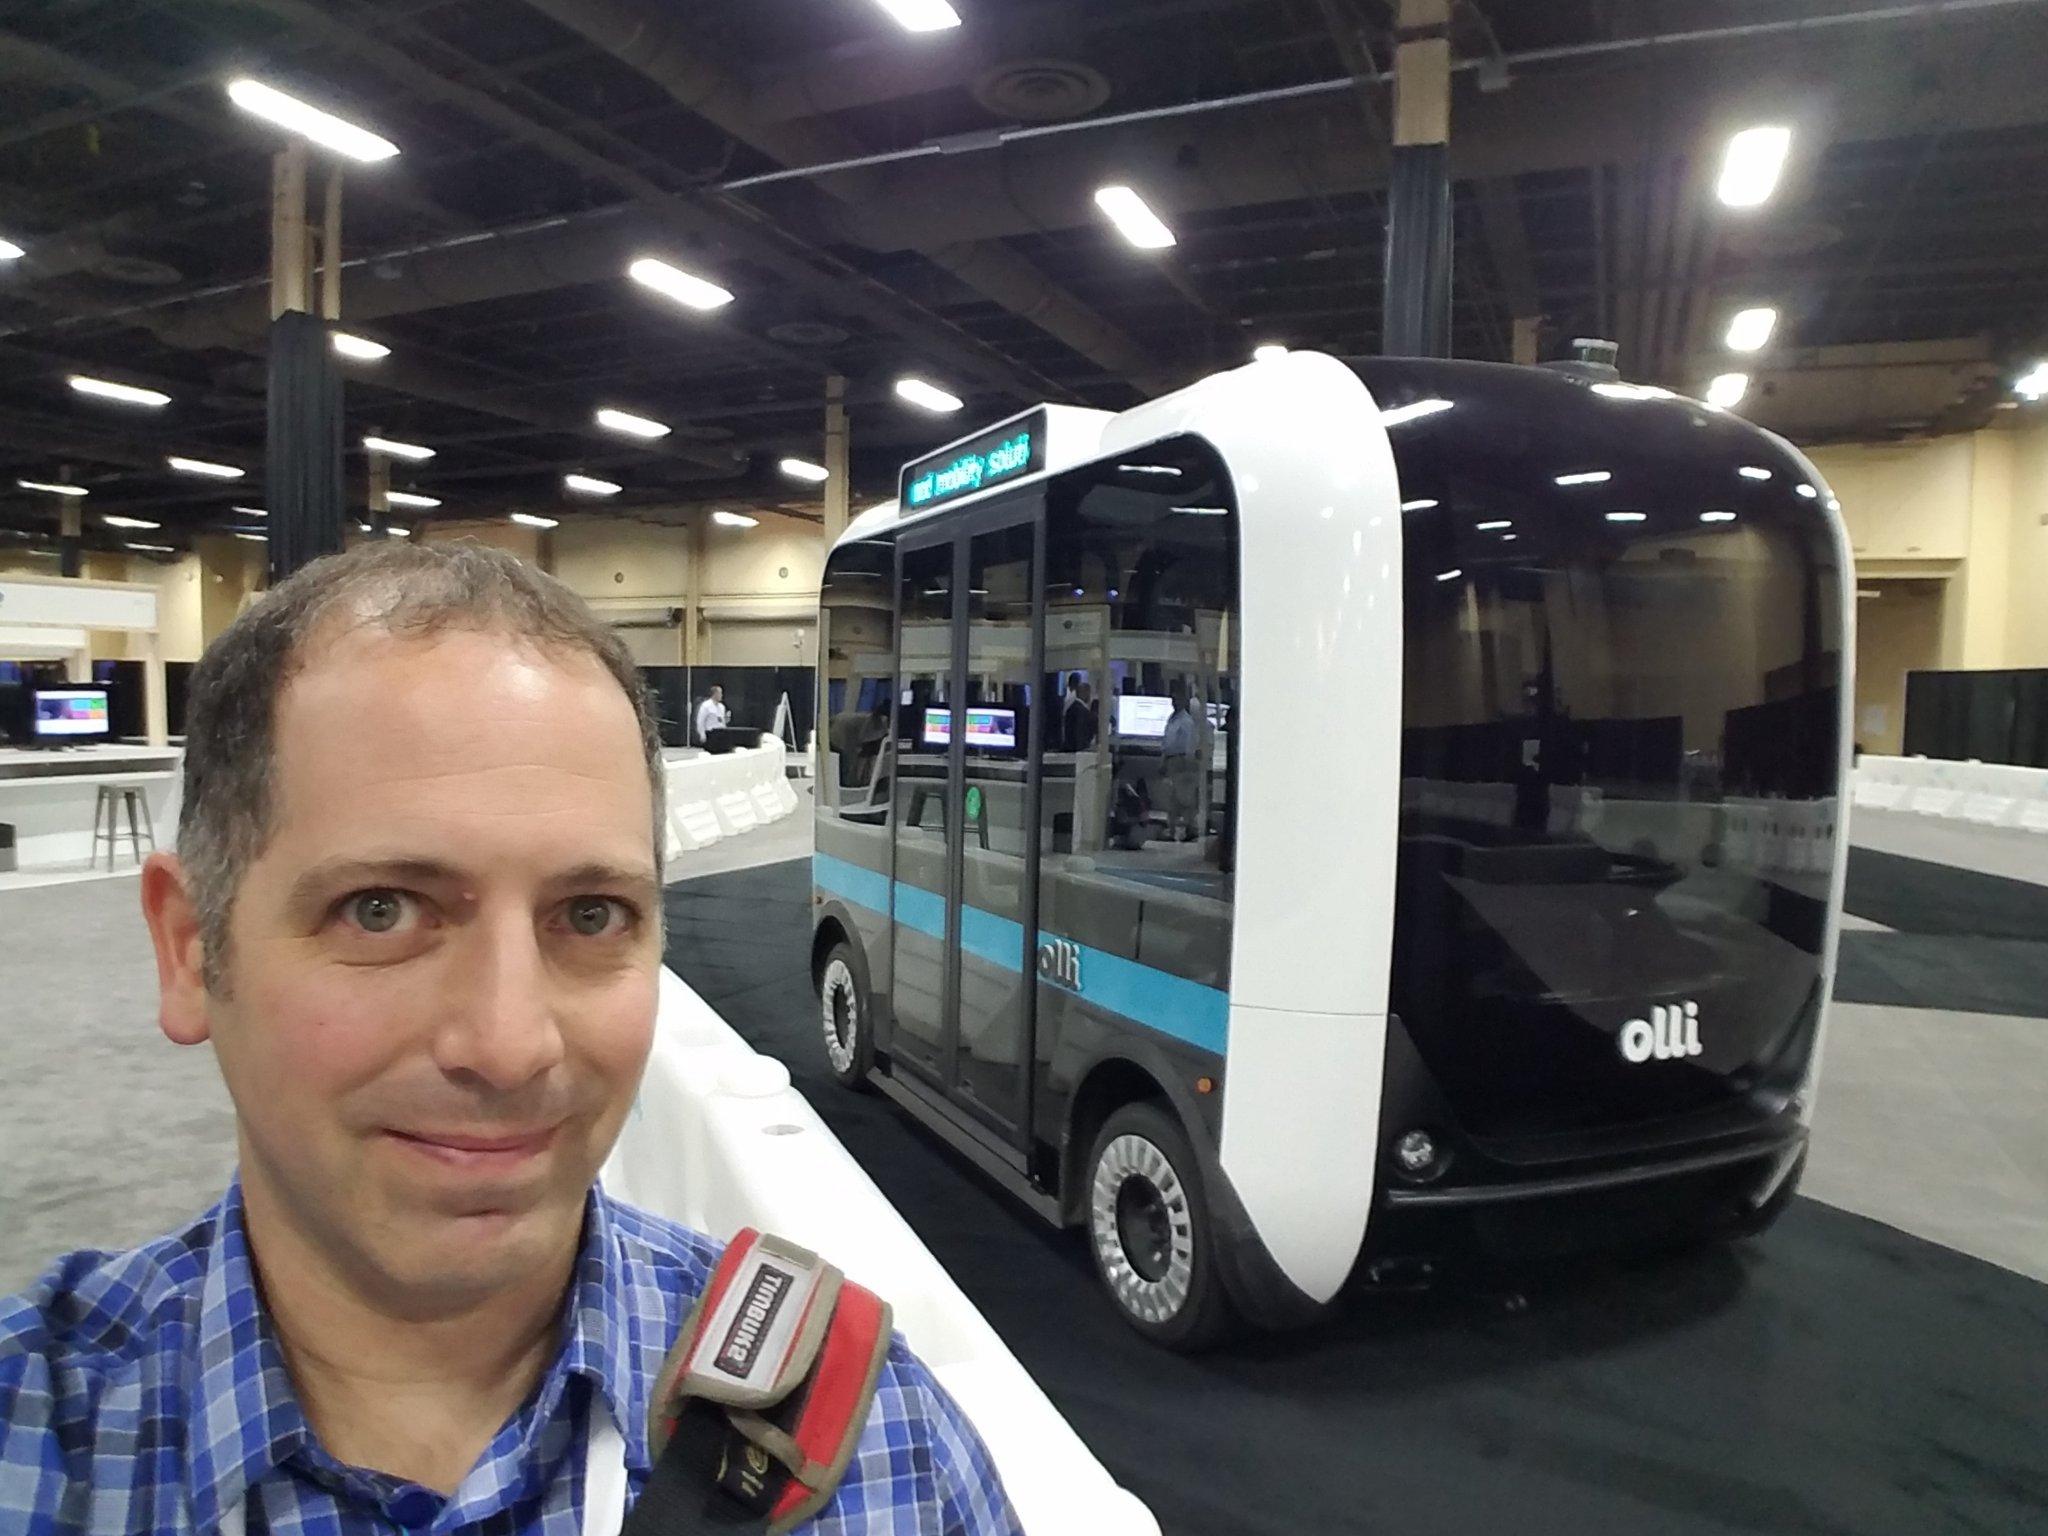 Very cool. @localmotors #olli self driving bus. @IBMWatson #ai #ibmwow #autonomouscar https://t.co/0b72kOboAs